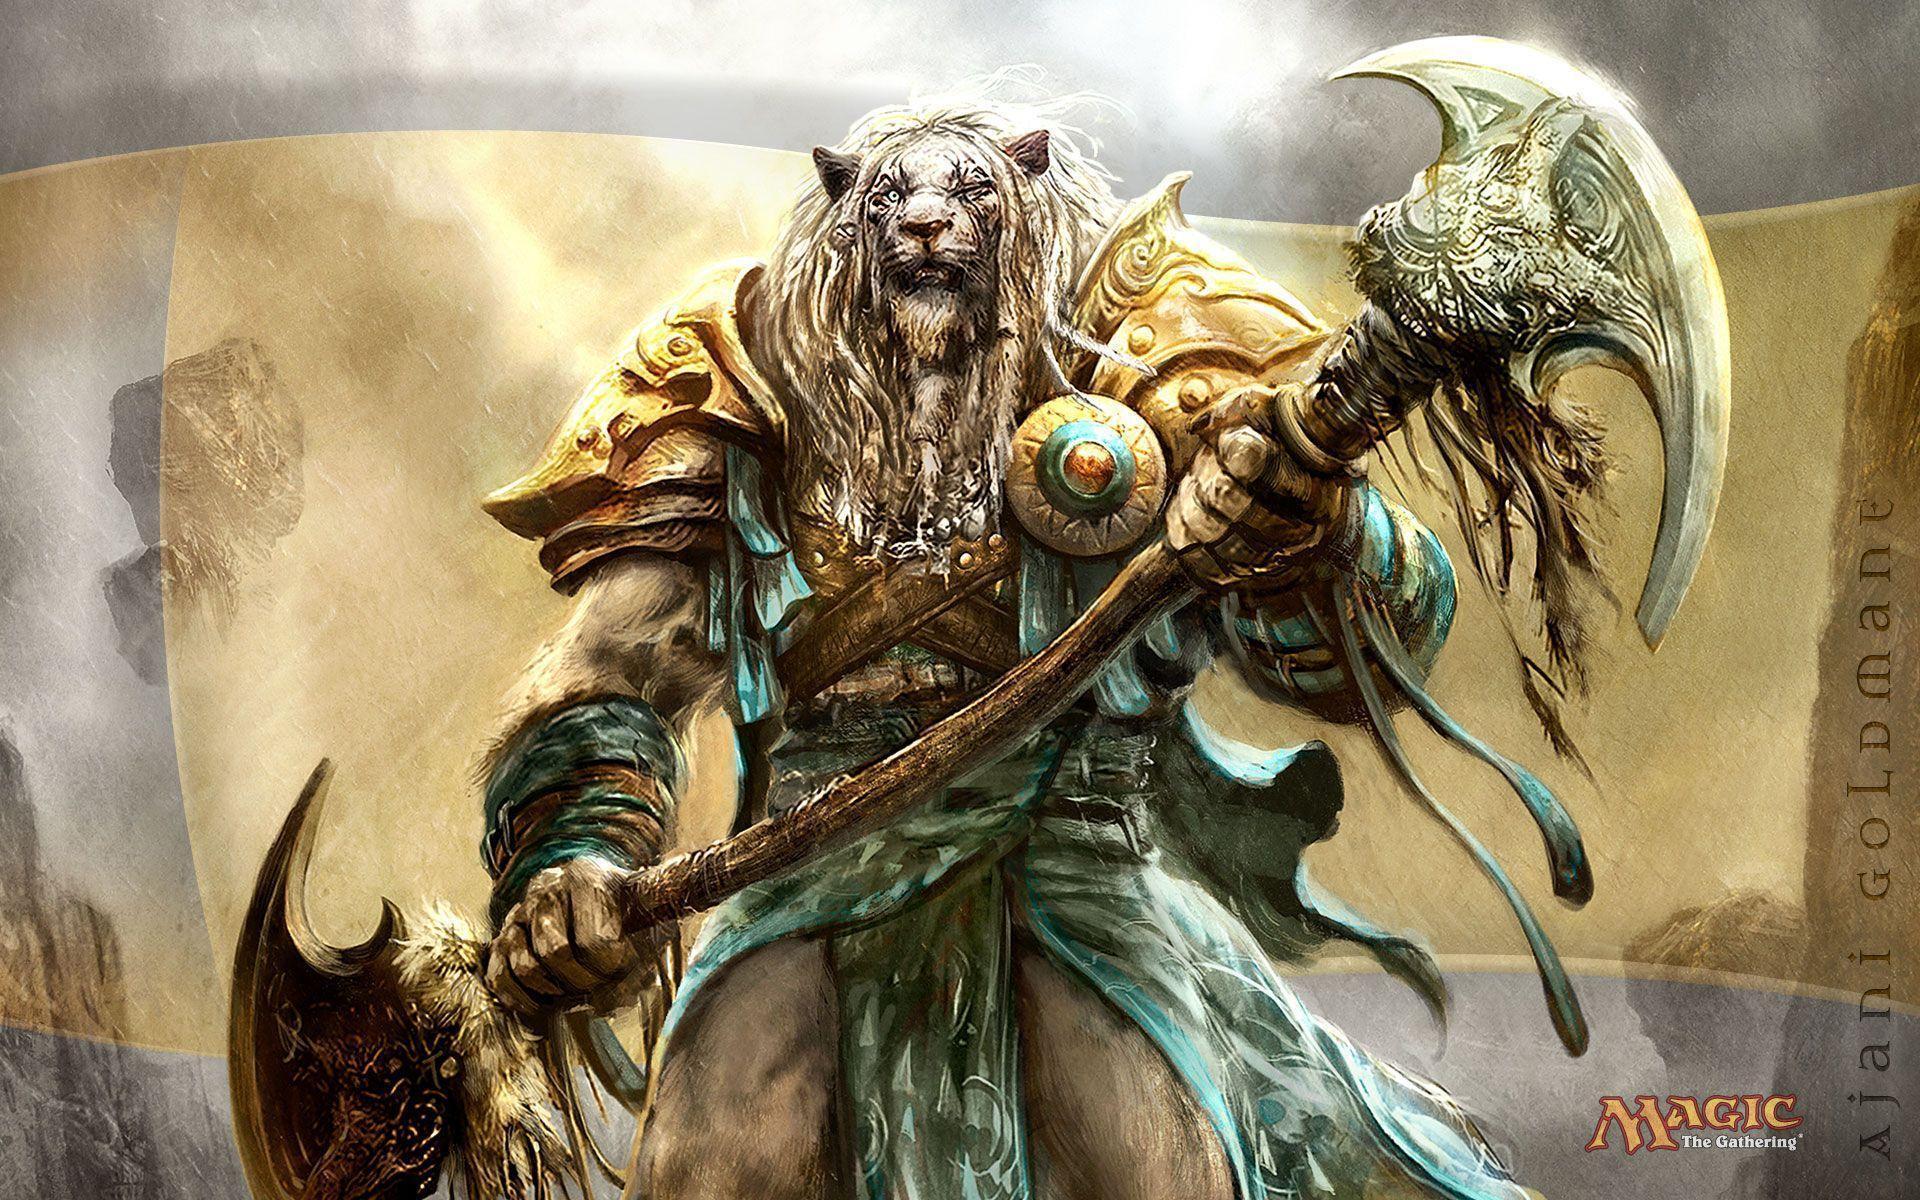 Warrior Fantasy Art Armor Angel Magic Wallpapers Hd: Anime Warrior Wallpapers